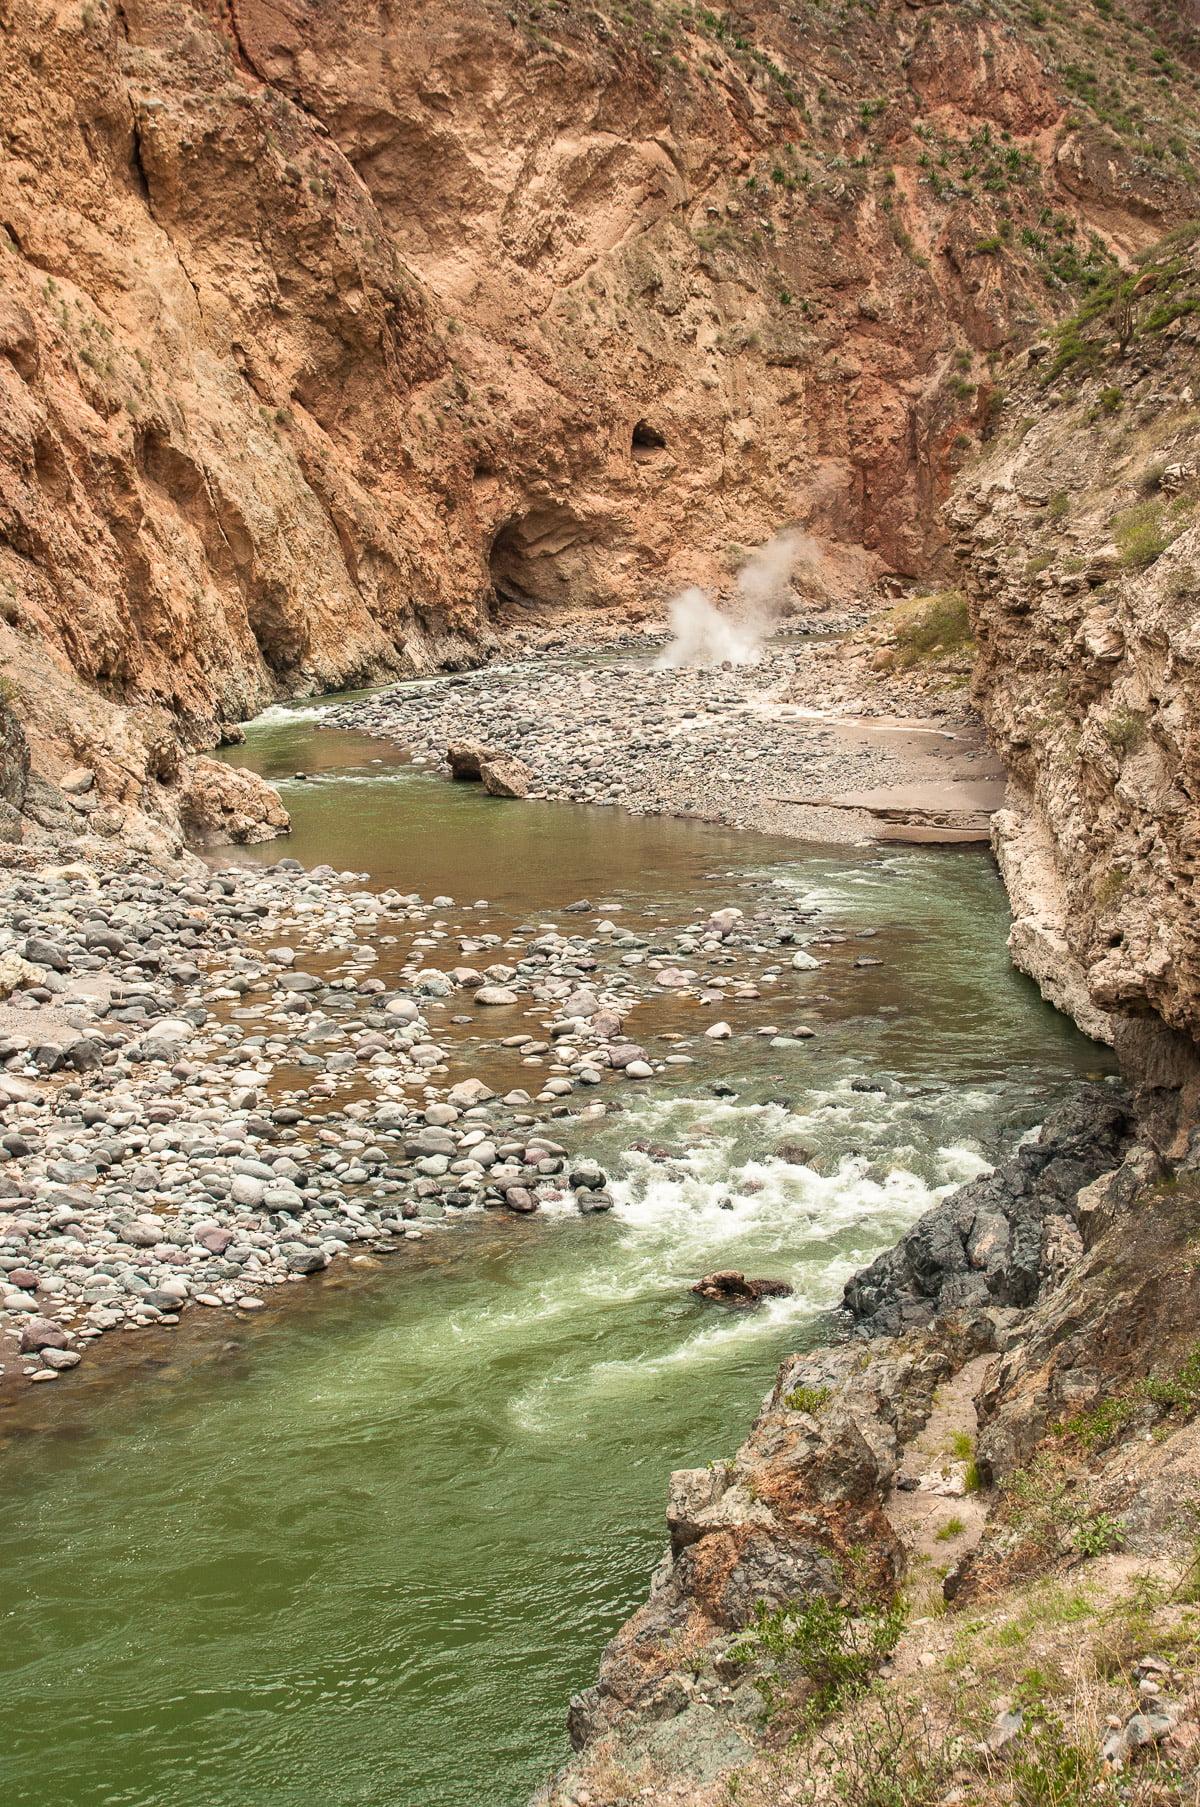 Source chaude canyon de colca pérou